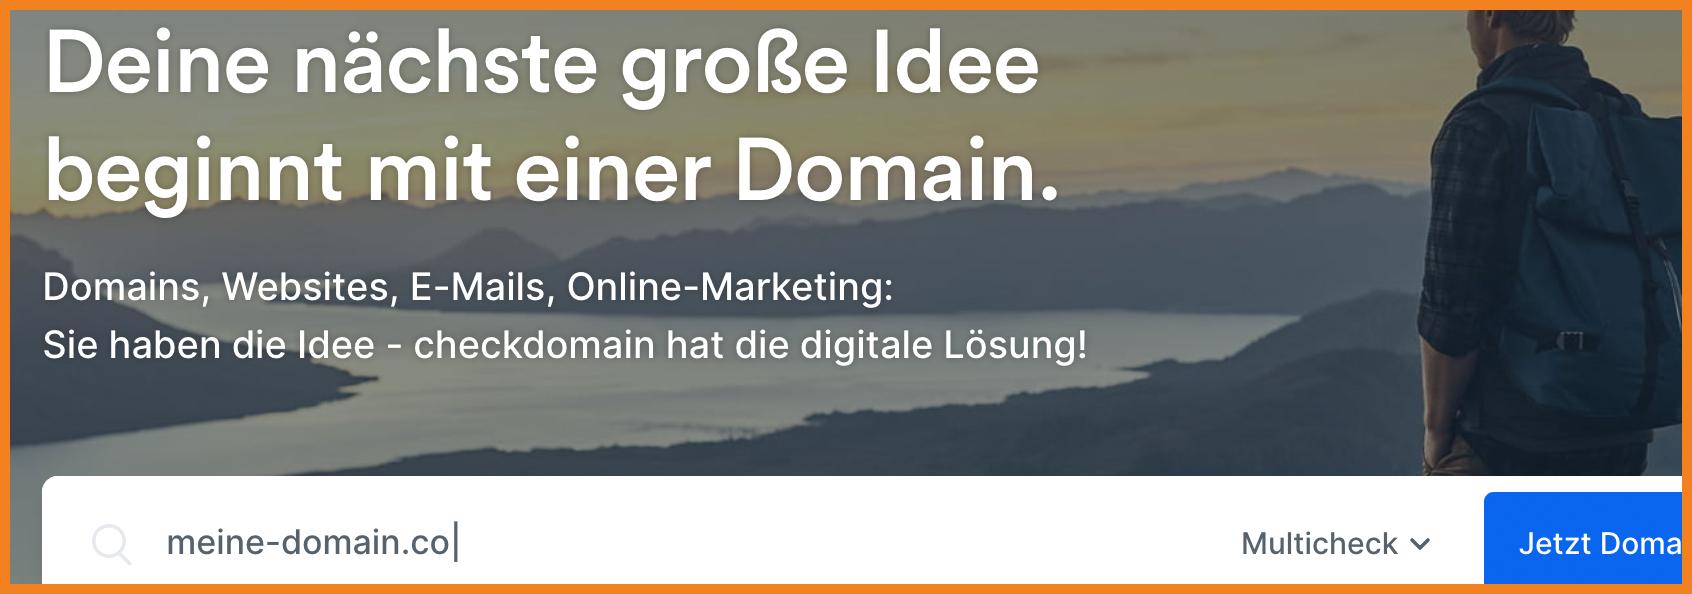 screenshot-domain